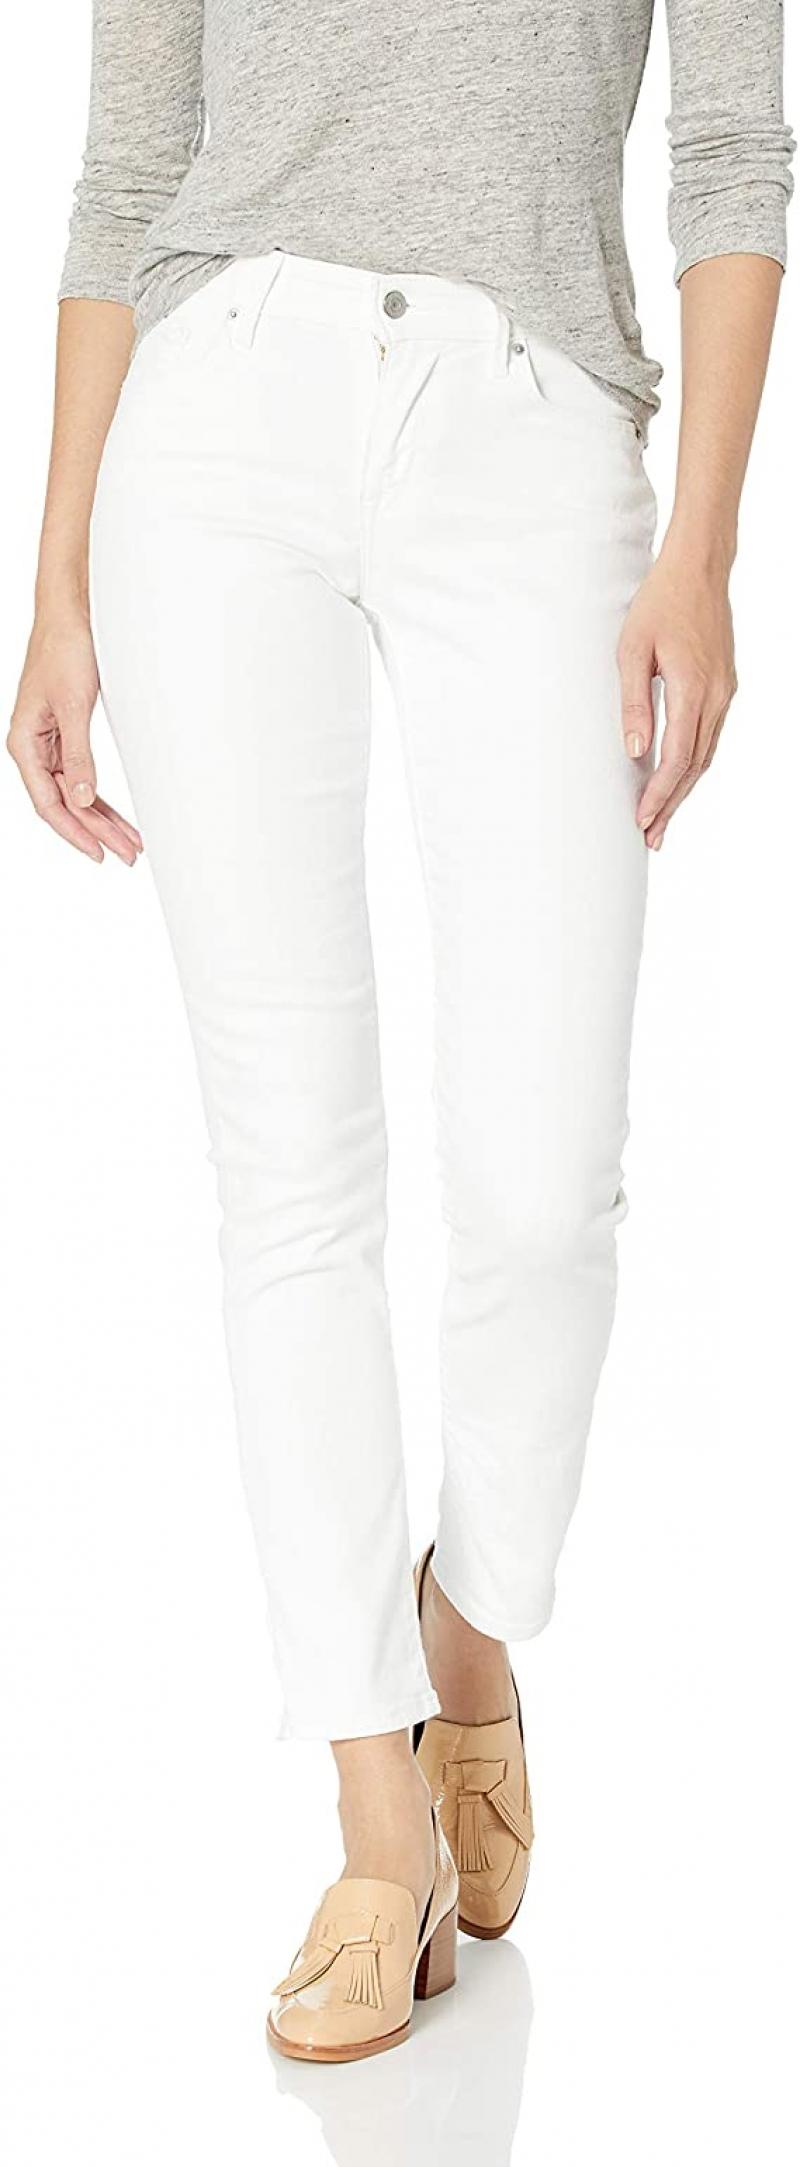 ihocon: Levi's Women's Classic Mid Rise Skinny Jeans 女士中腰緊身牛仔褲